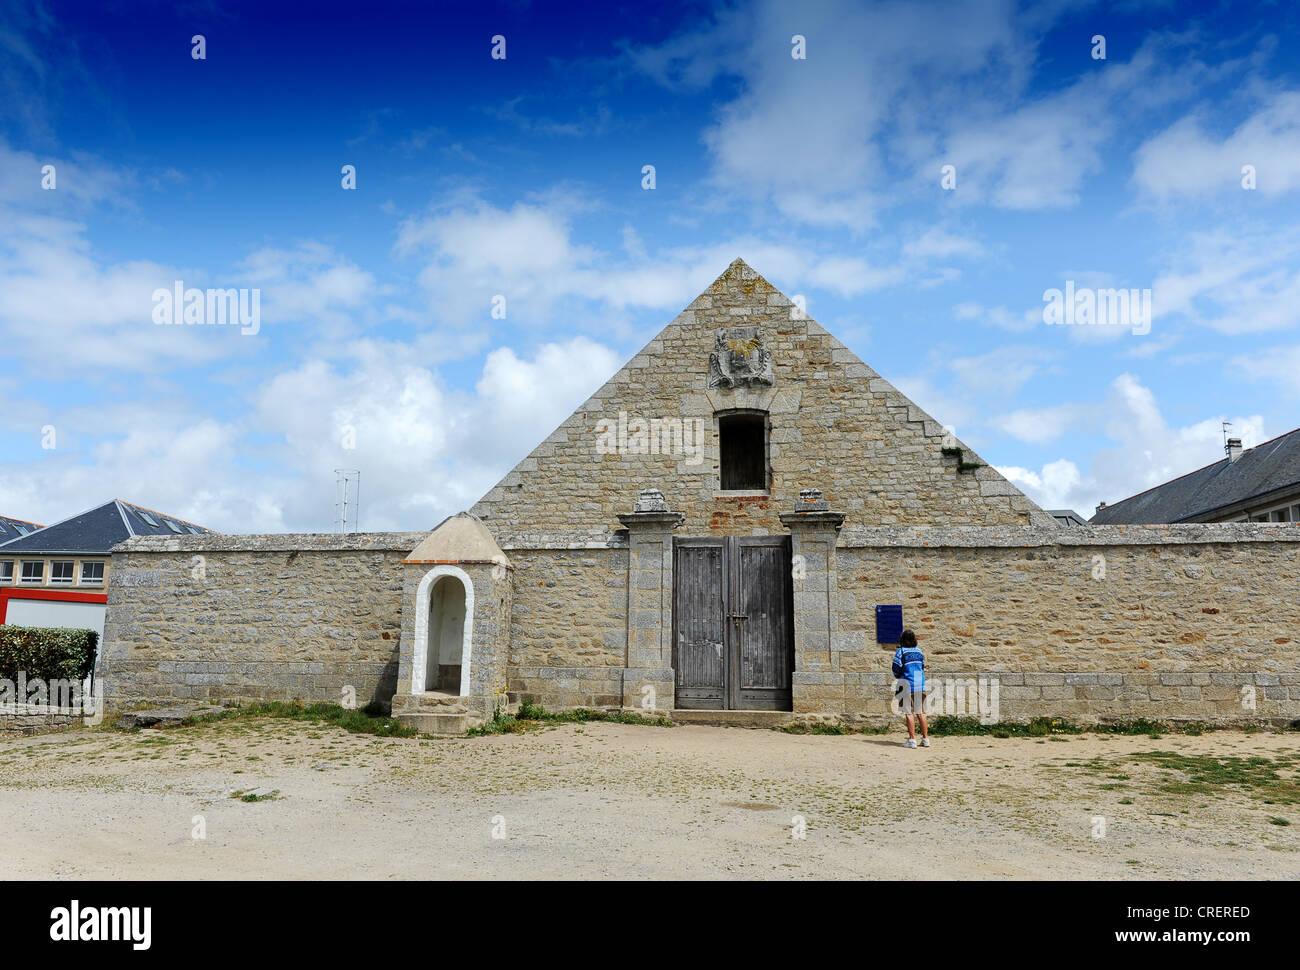 Grande poudrière at Port Louis Morbihan Brittany France - Stock Image